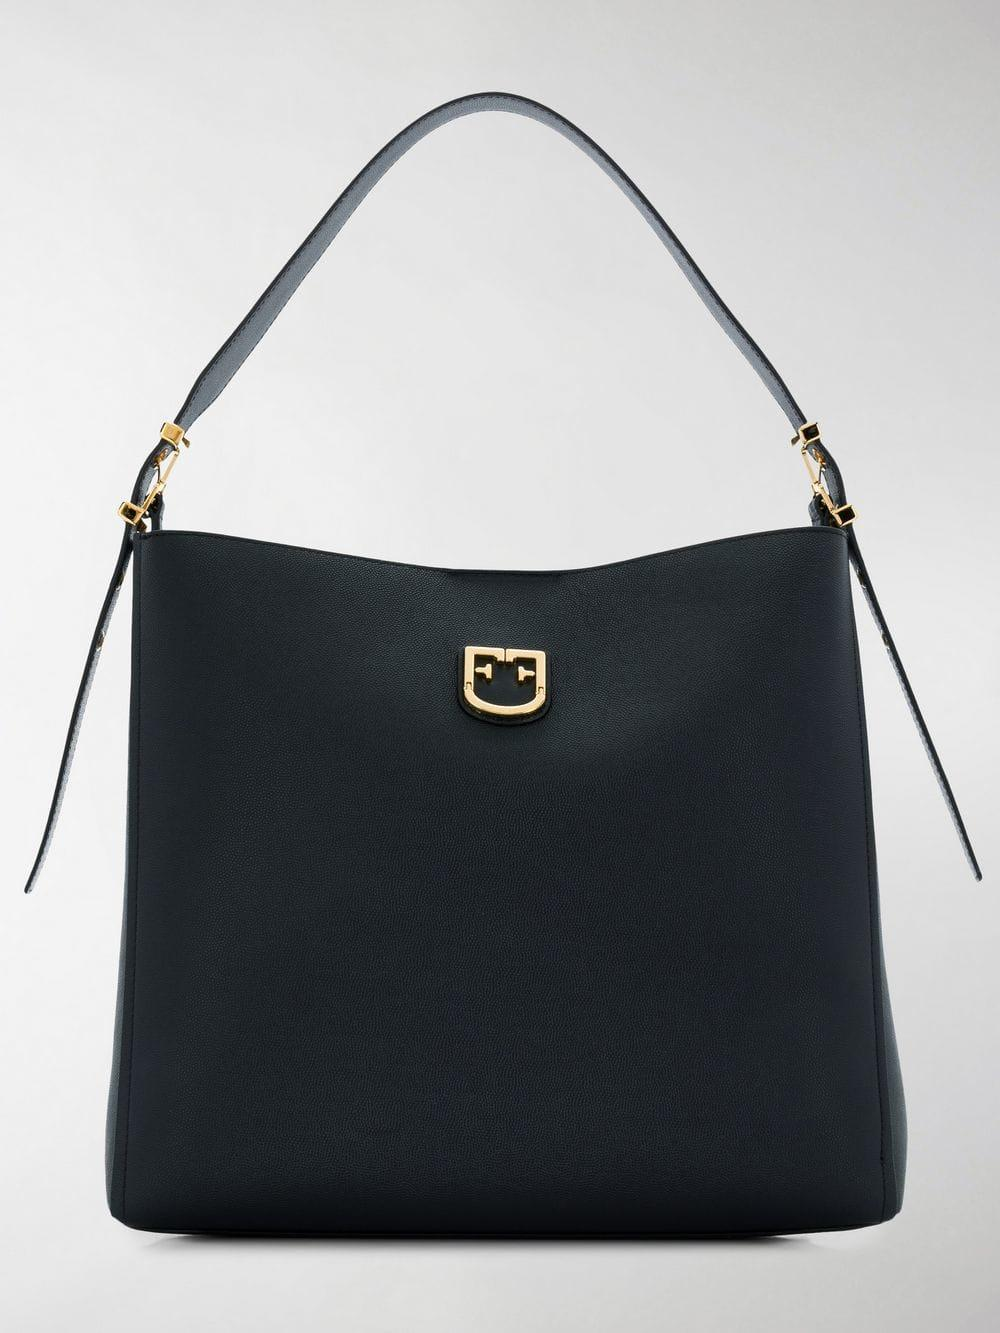 e826f05bd22c Lyst - Furla Belvedere Hobo Tote Bag in Black